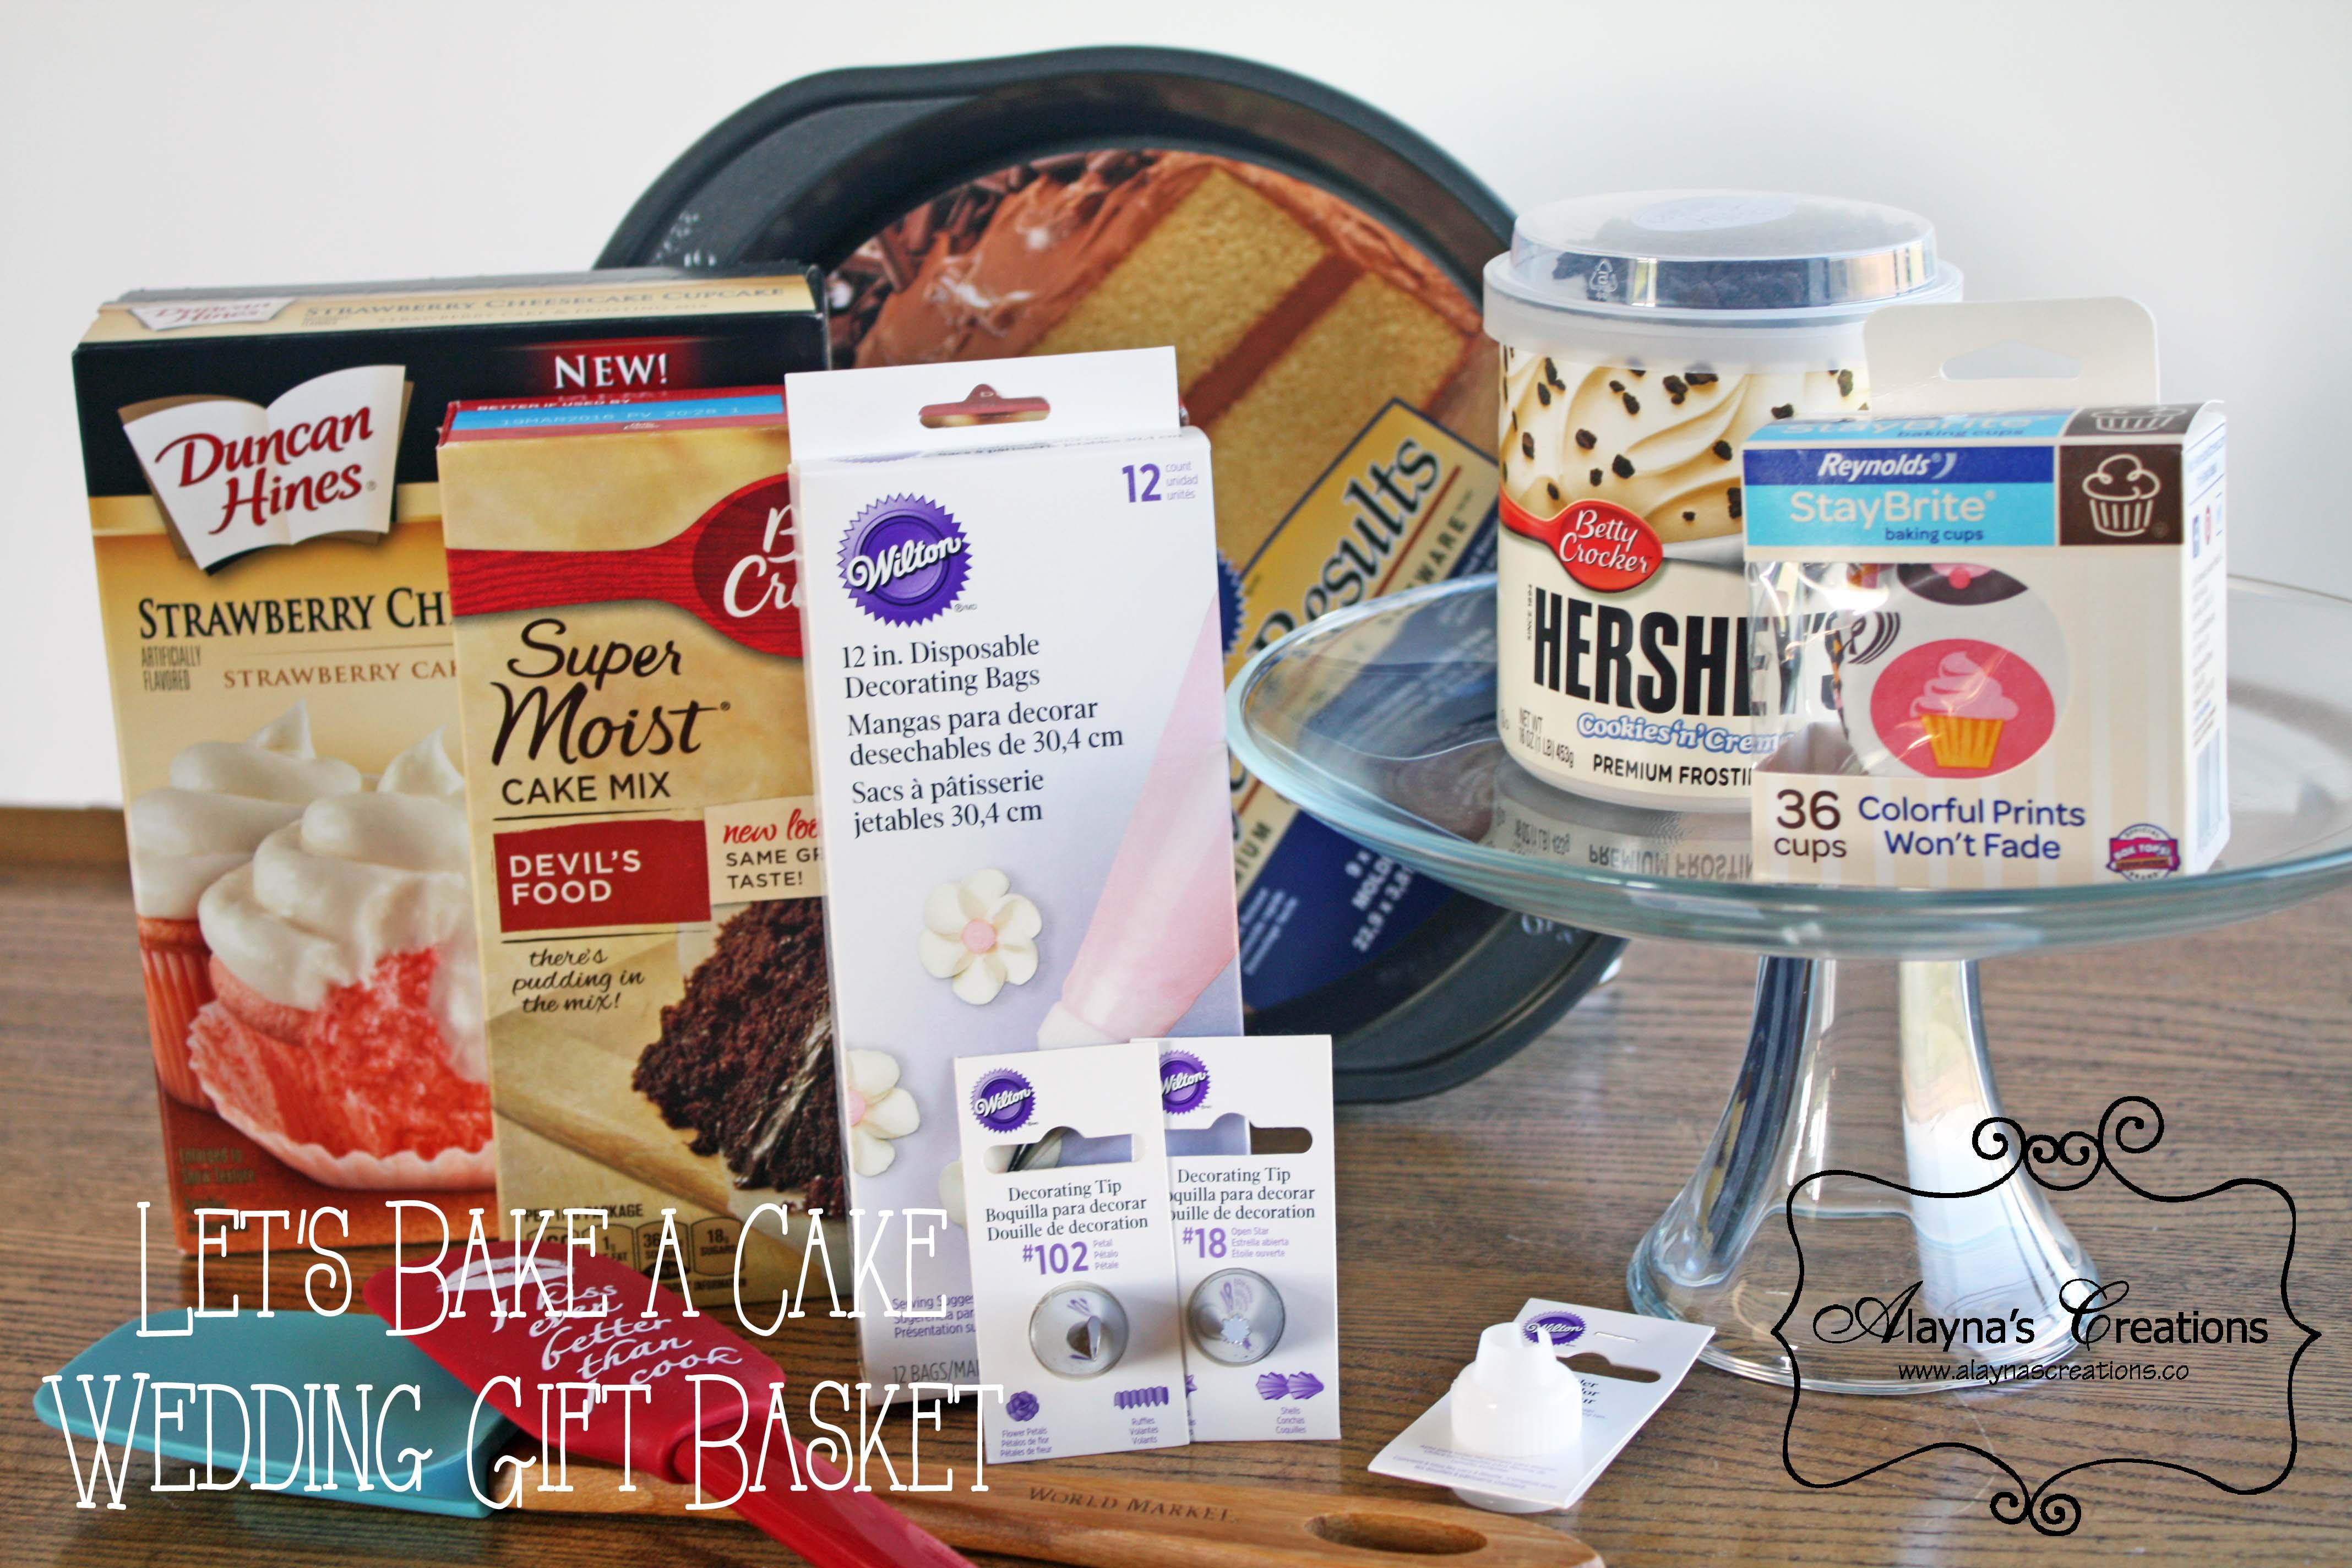 Let's Bake a Cake - Wedding Gift Basket - DIY home decor and crafts